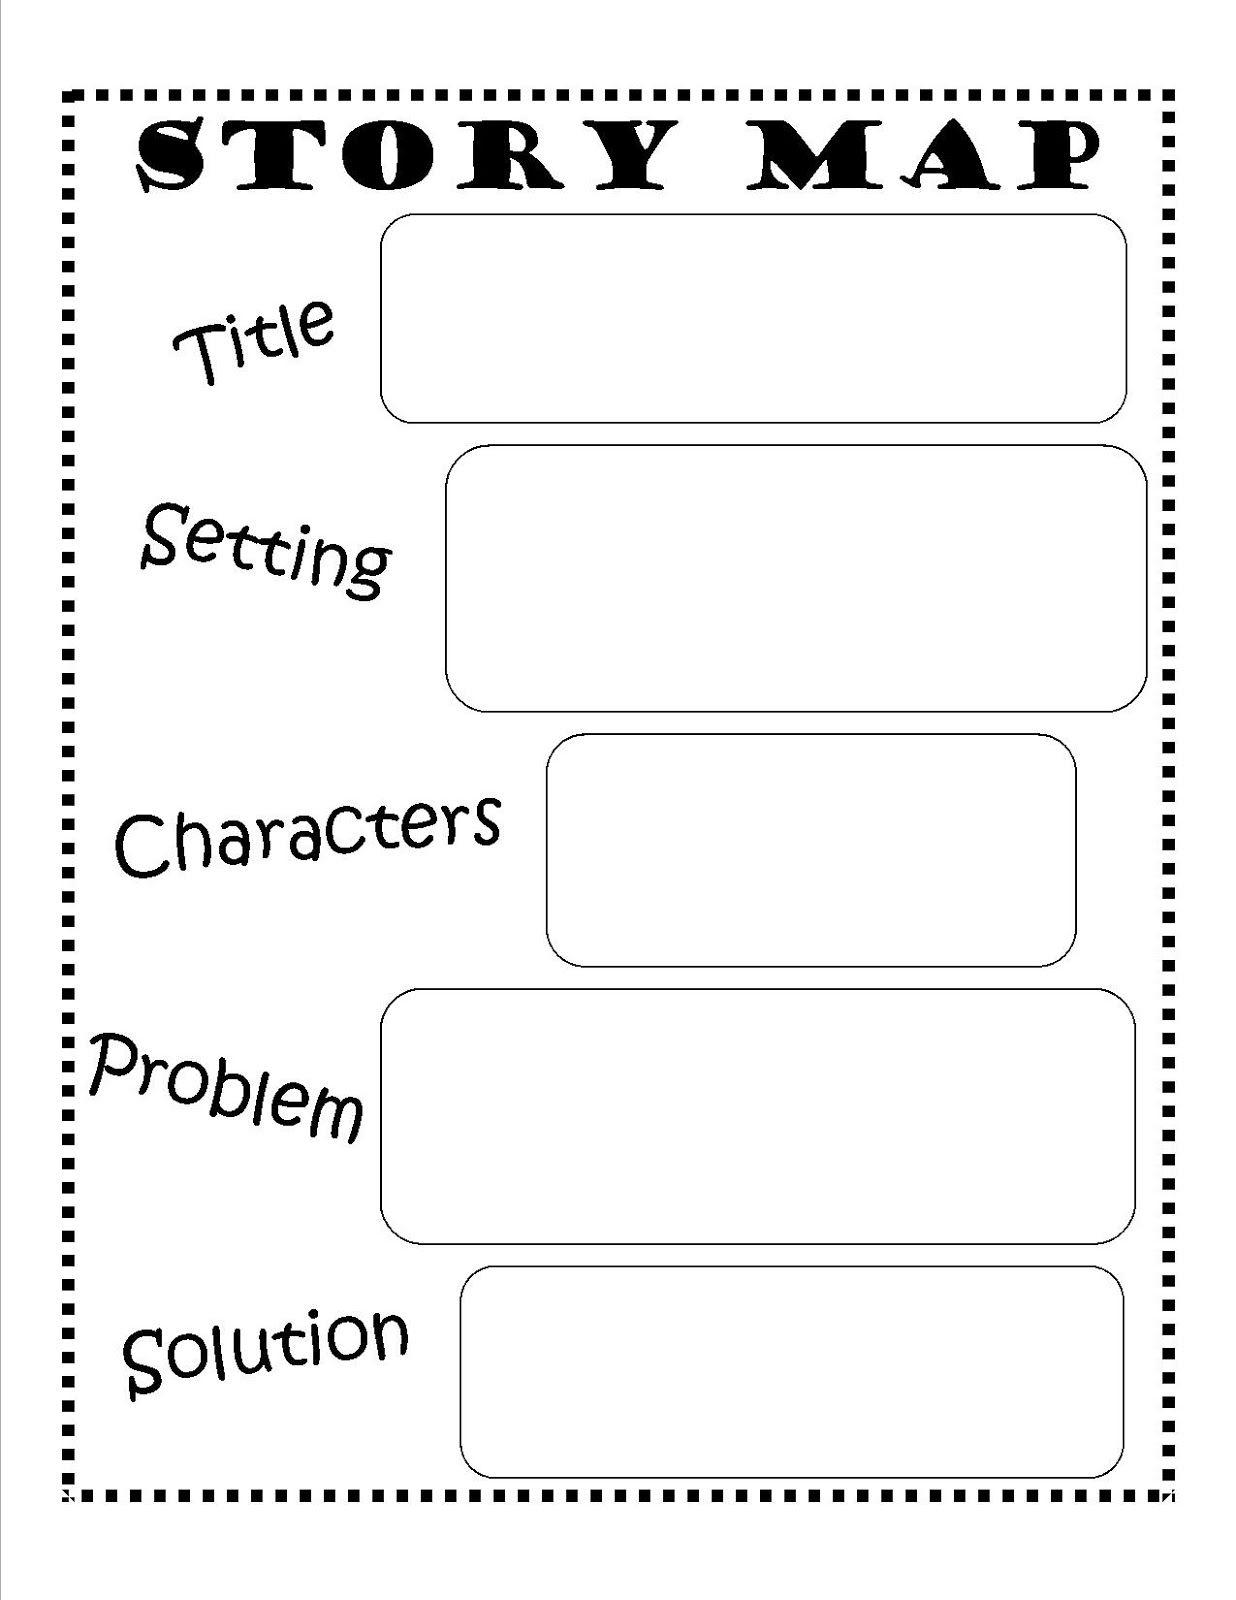 Story Map - Free Printable #reading #writing #kids | Ela | Pinterest - Free Printable Story Map